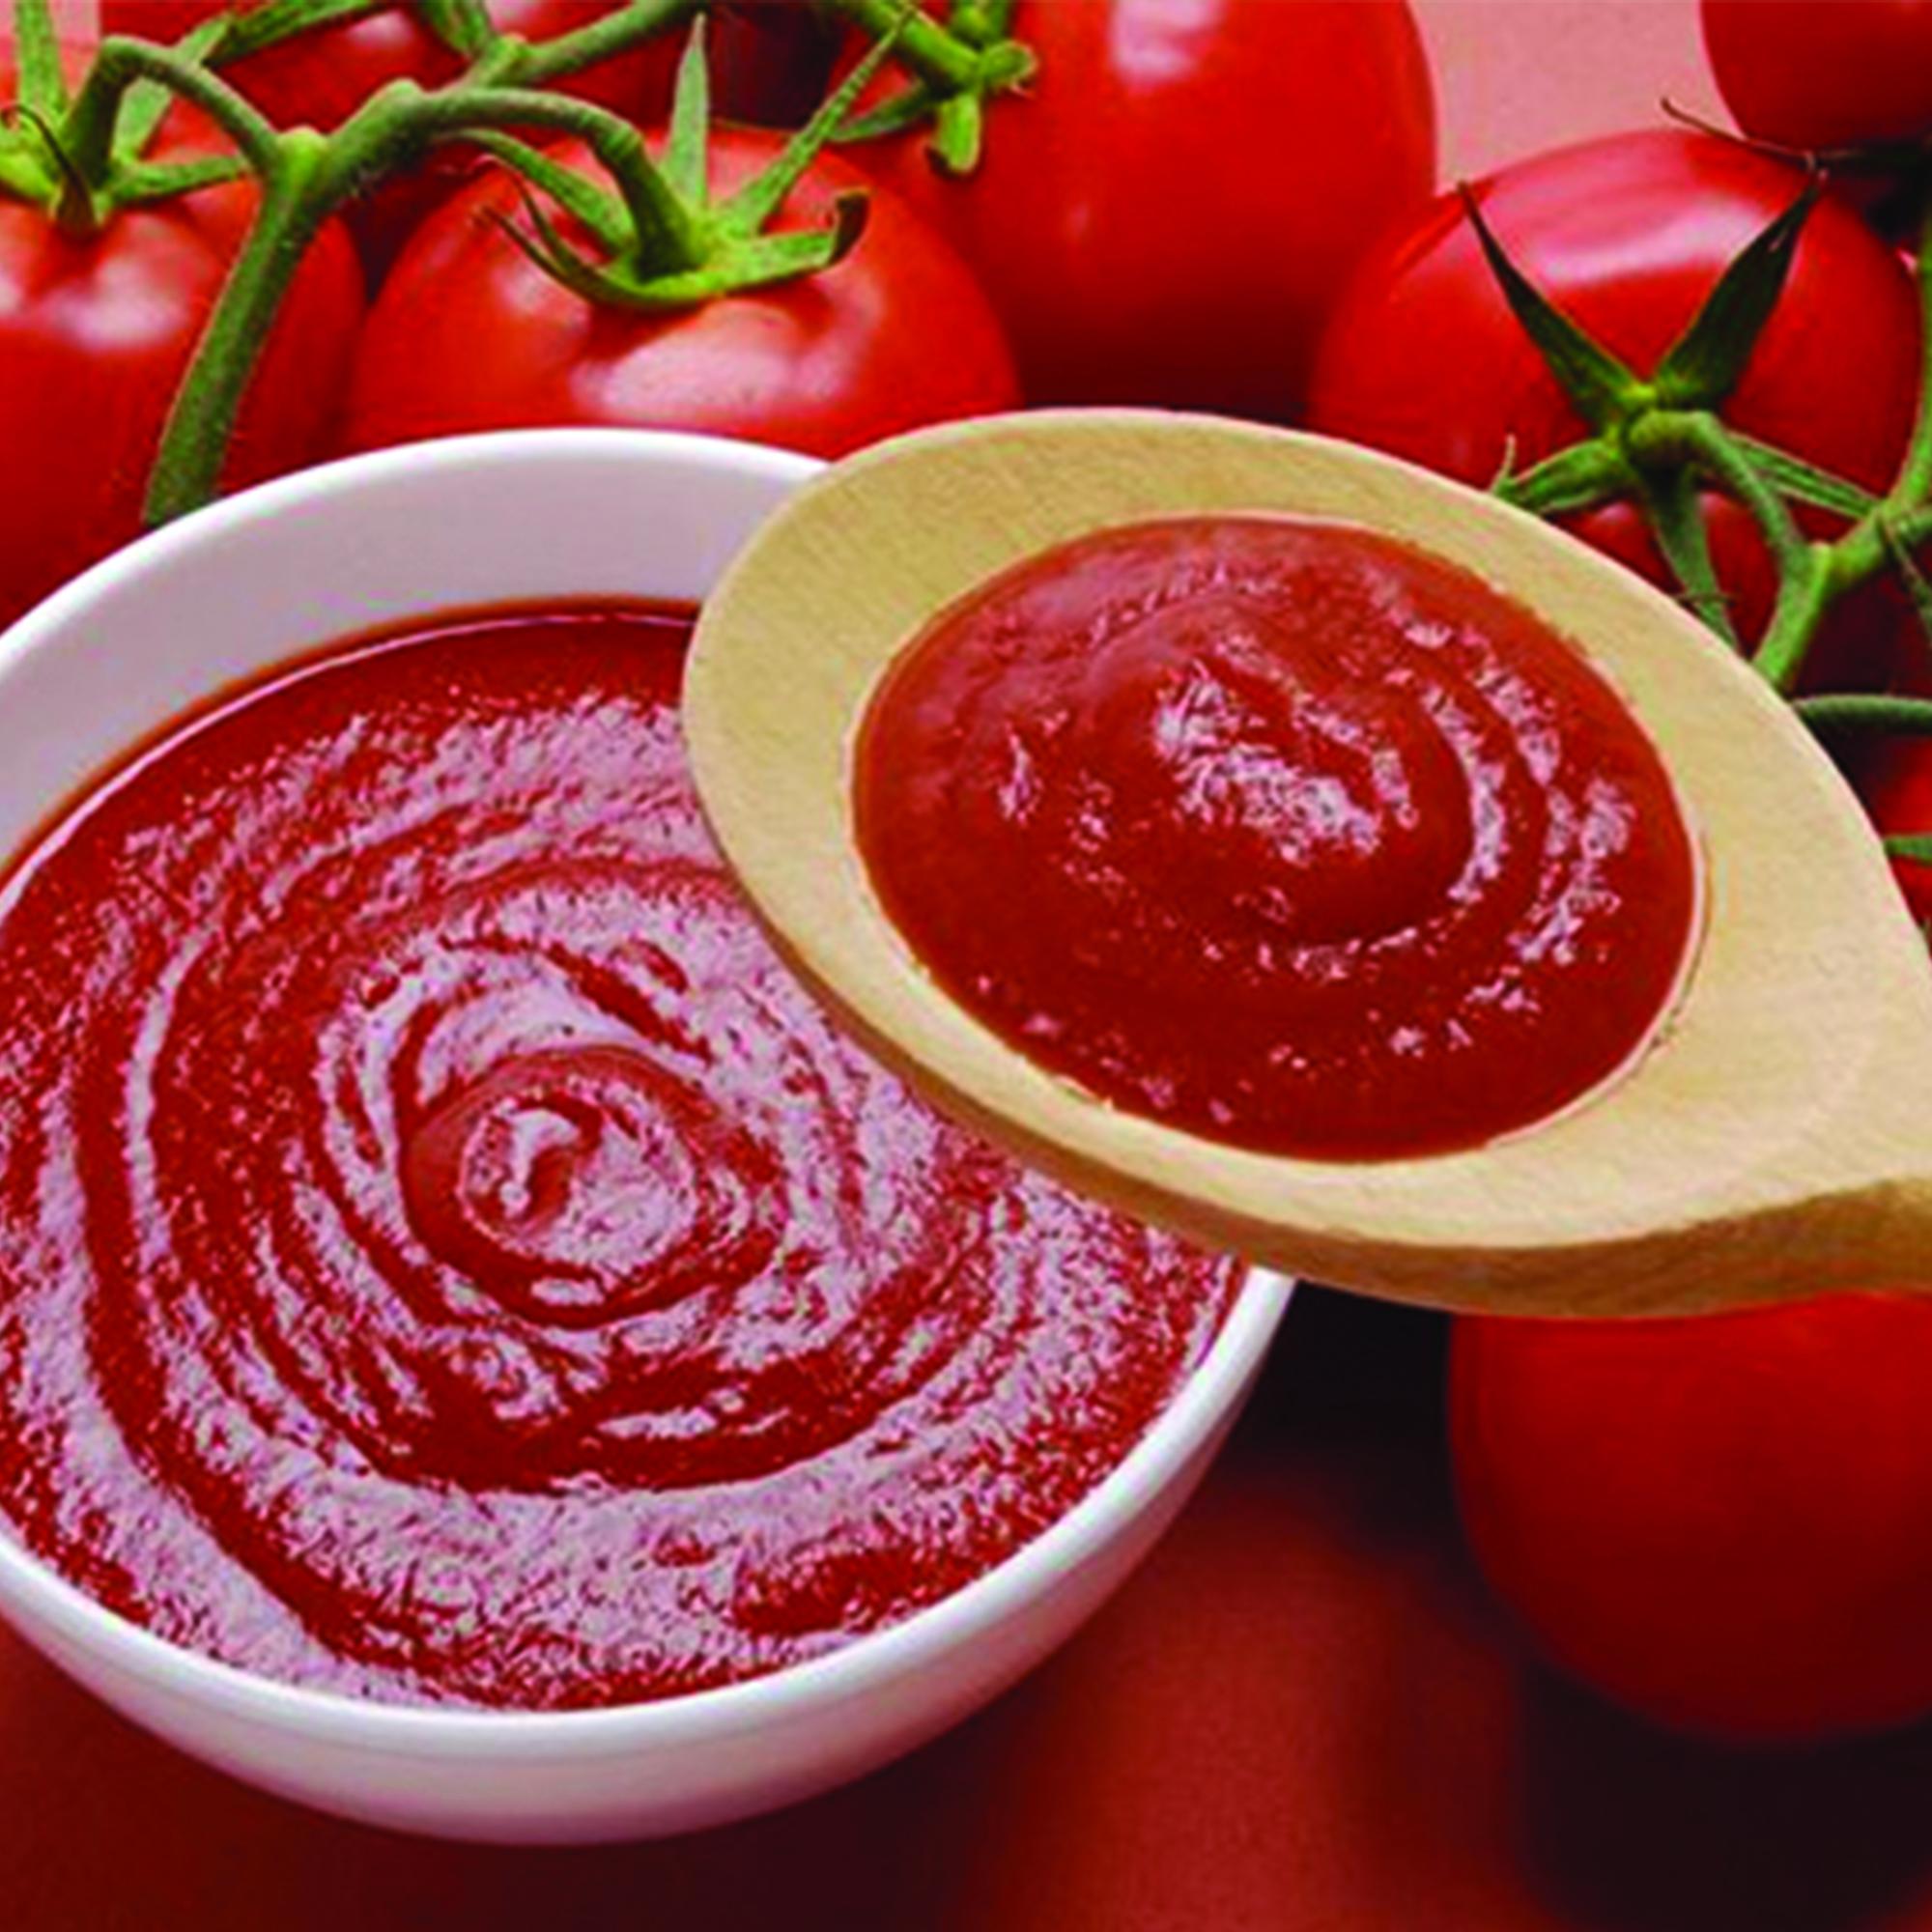 رب گوجه فرنگی حسنی - 680 گرم